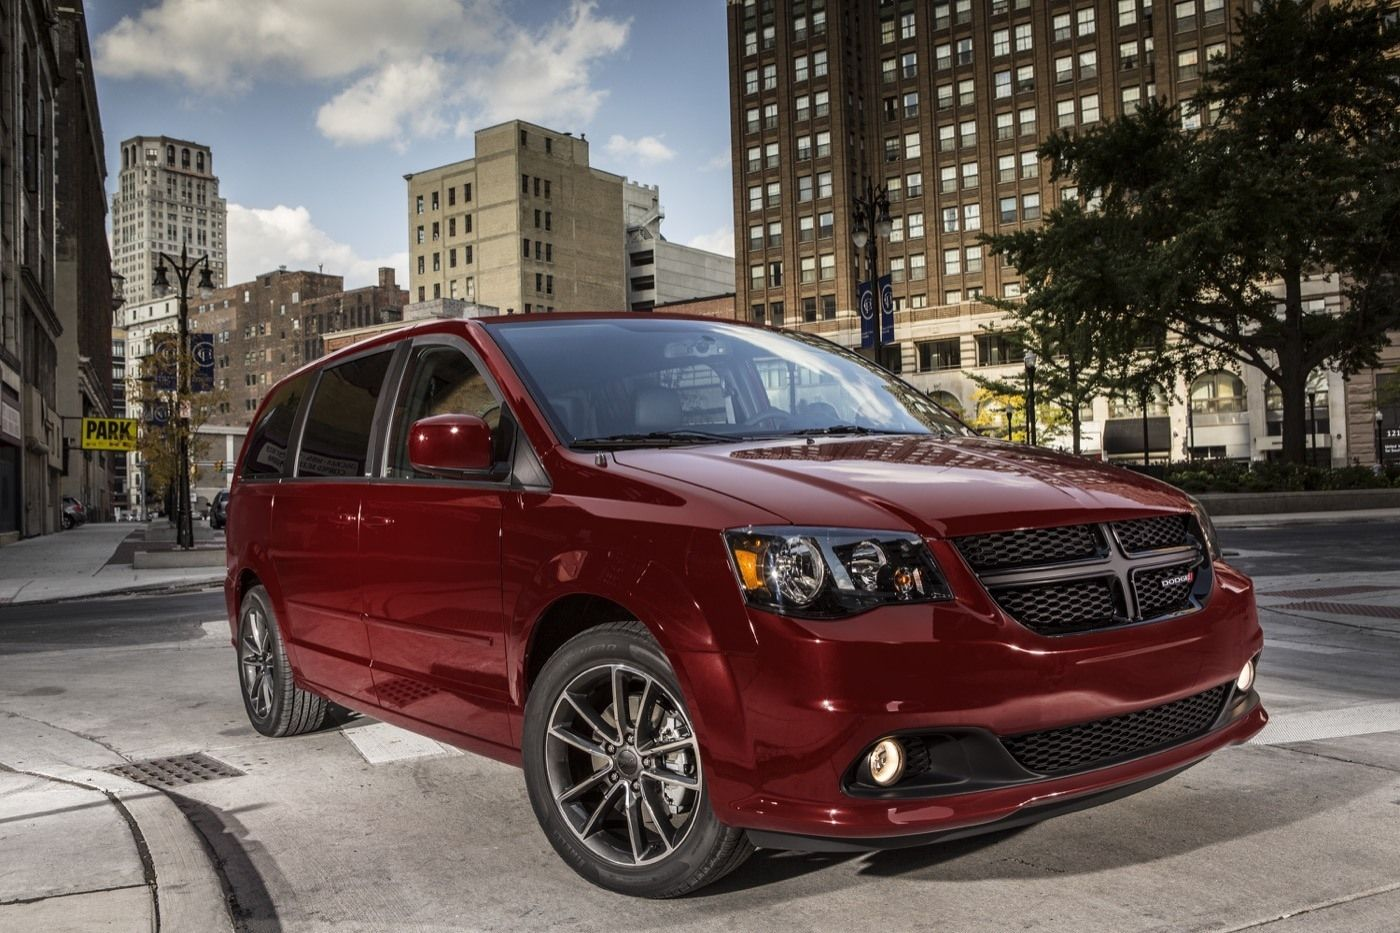 2019 Dodge Minivan Exterior And Interior Review